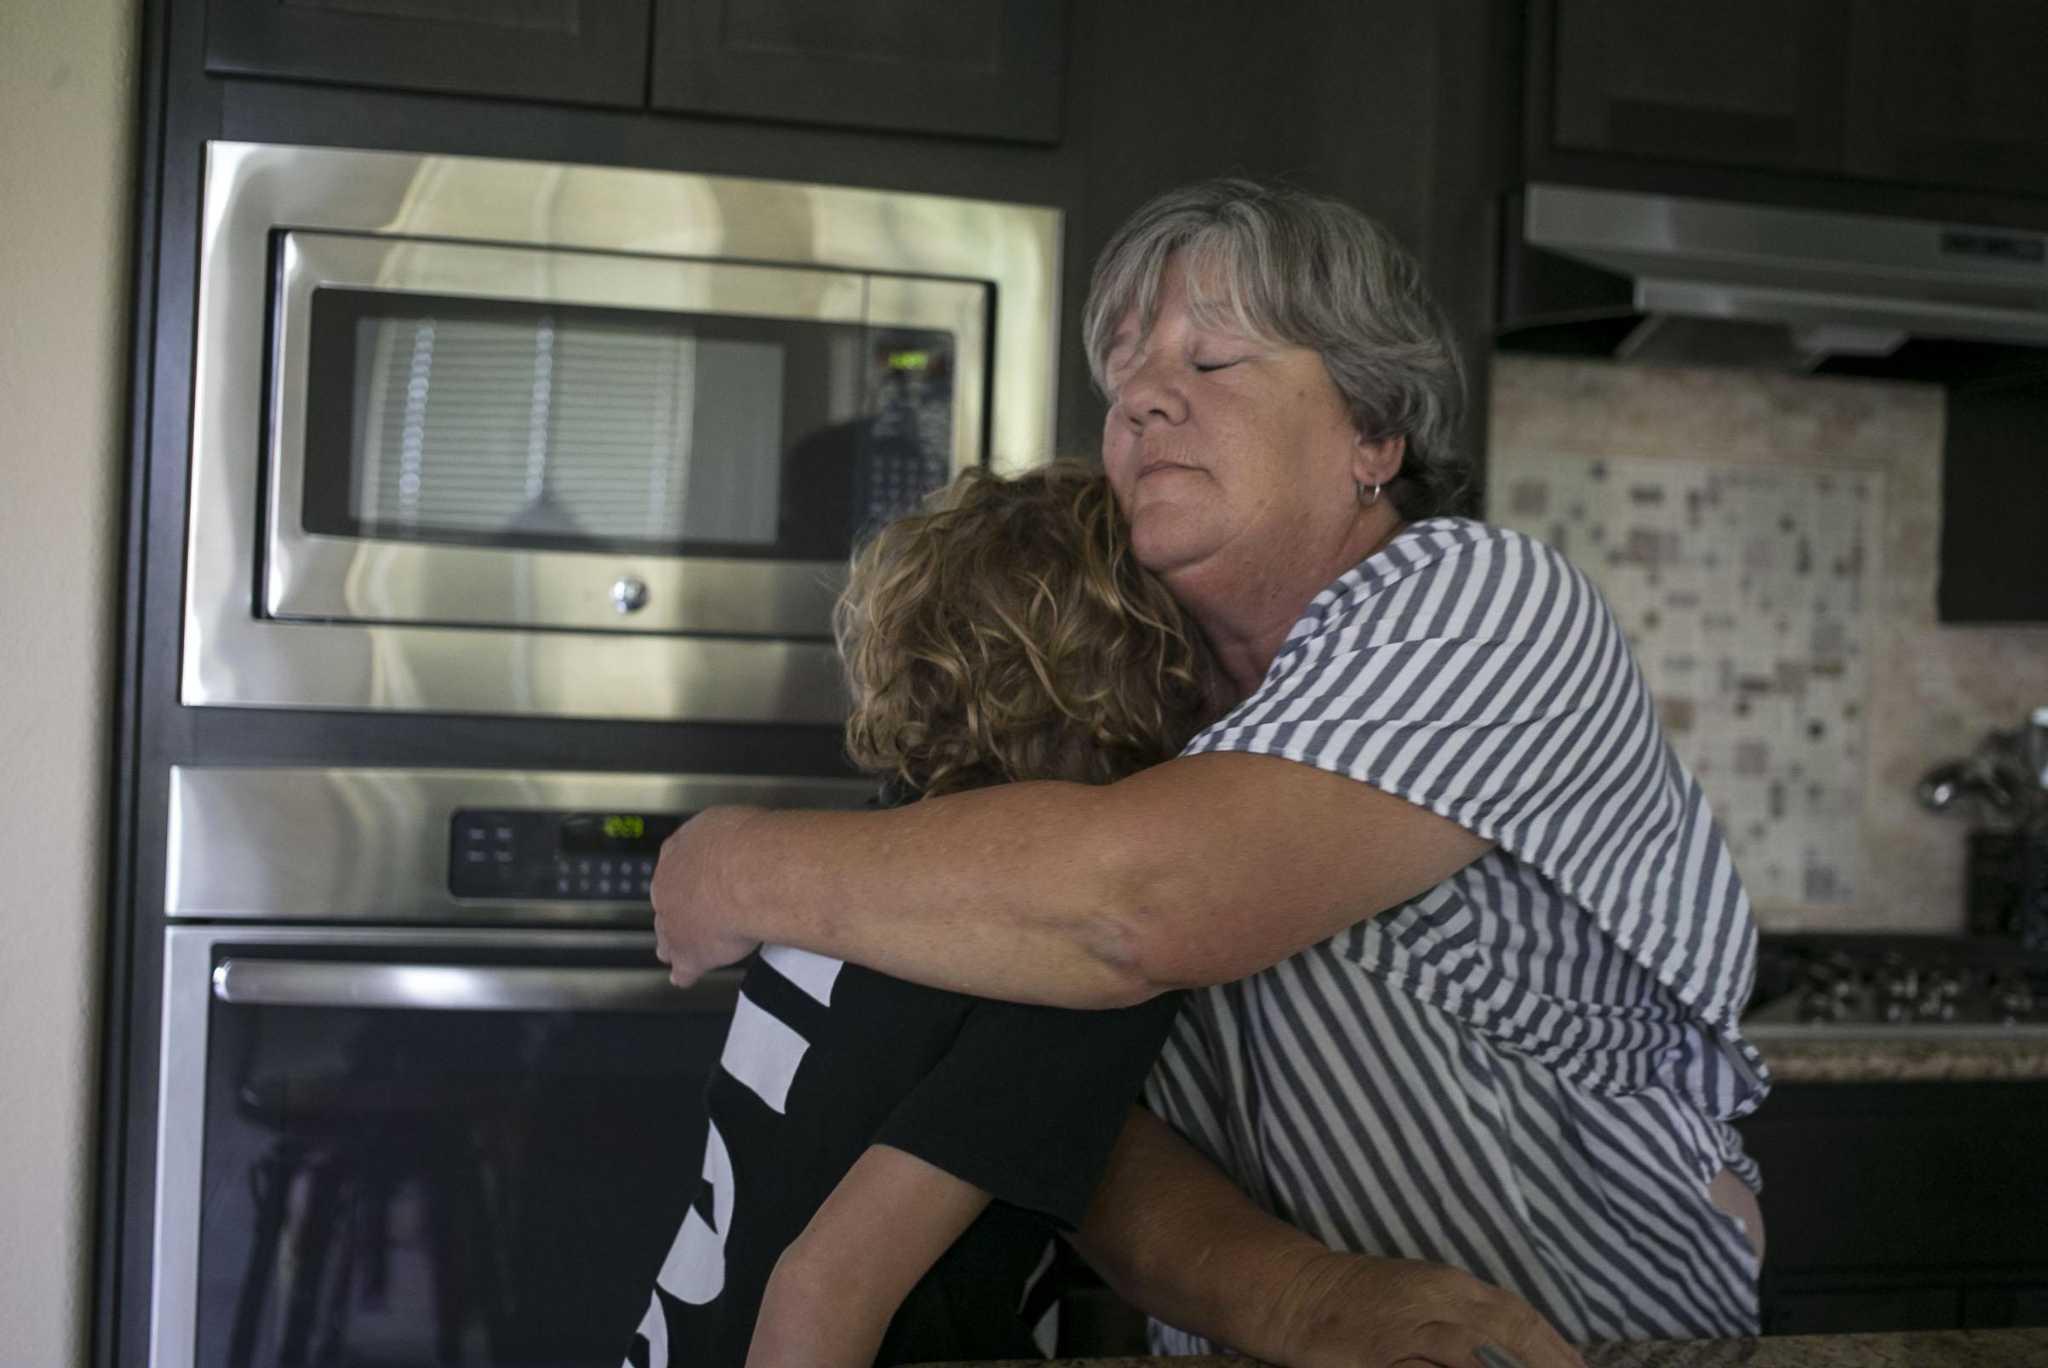 Podcast: Petti McClellan-Wiese, mother of Texas child killed by 'Angel of Death' nurse Genene Jones, dies at 64